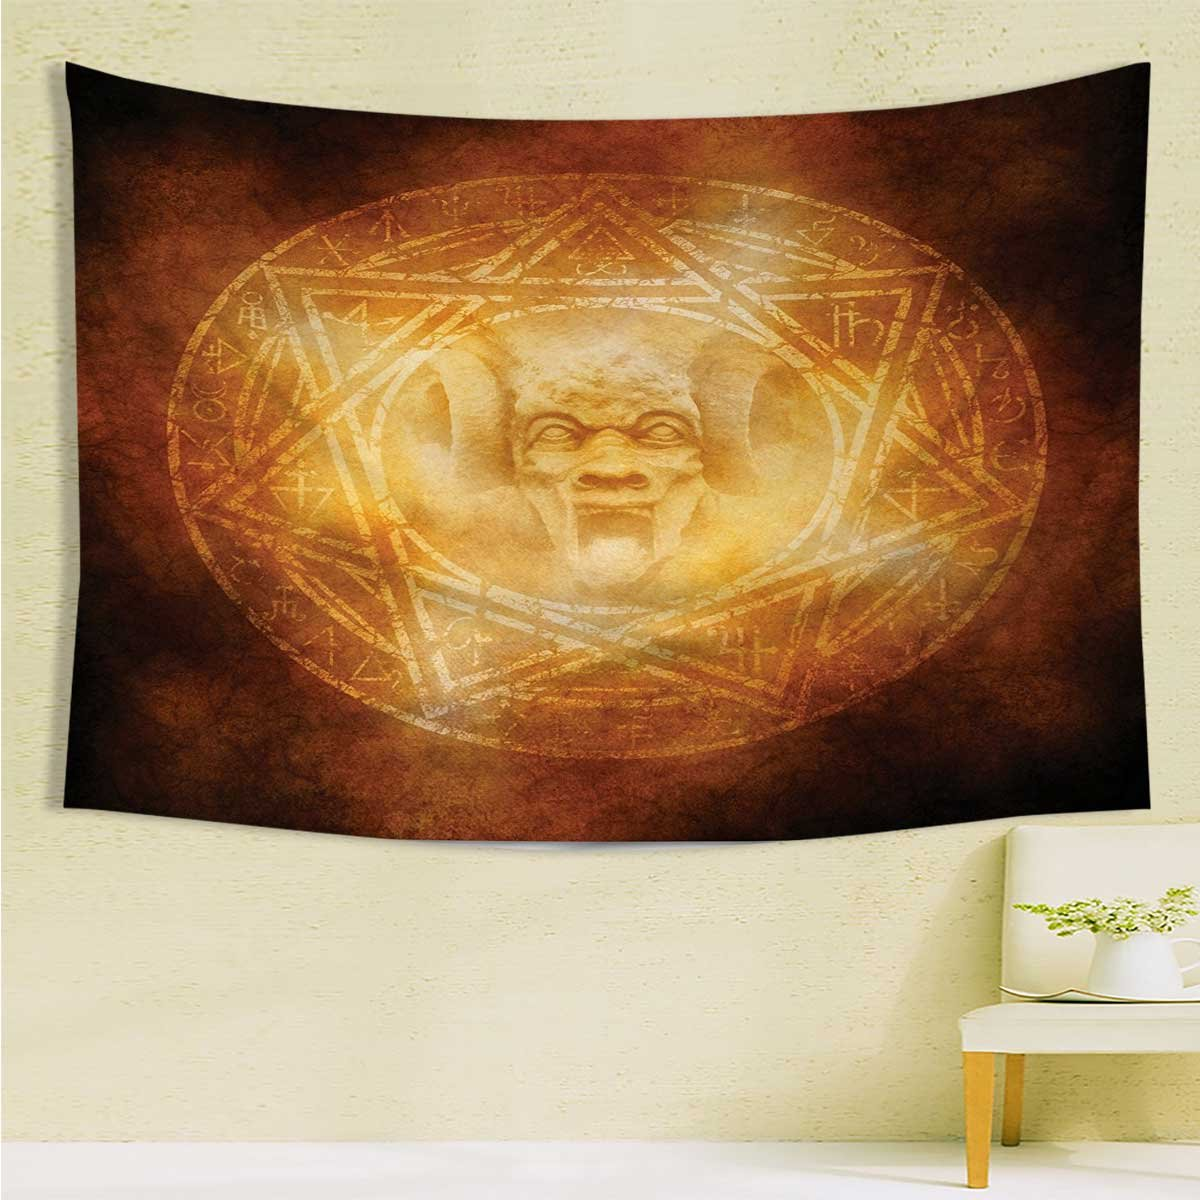 longbuyer Horror HouseBed Cover Blanket CurtainDemon Trap Symbol Logo Ceremony Creepy Scary Ritual Fantasy Paranormal Designfor Living RoomL59.1 xH82.7 Orange.